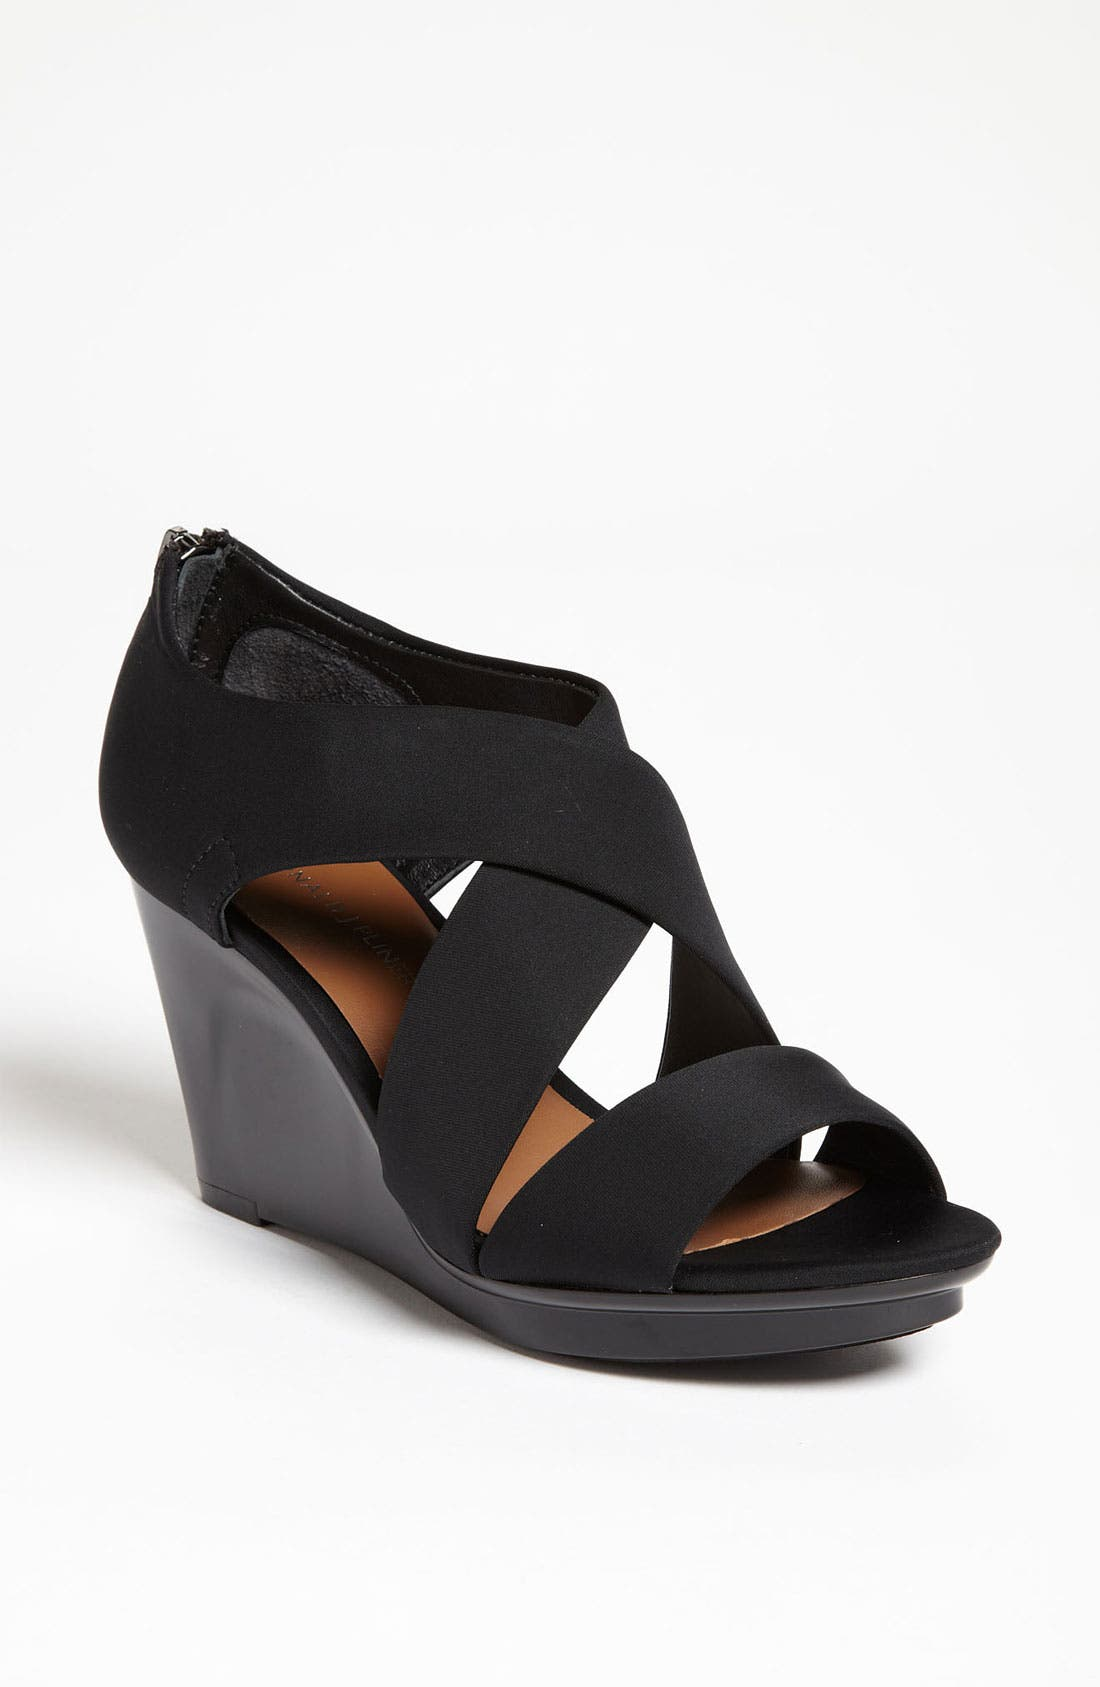 Main Image - Donald J Pliner 'Aurora' Sandal